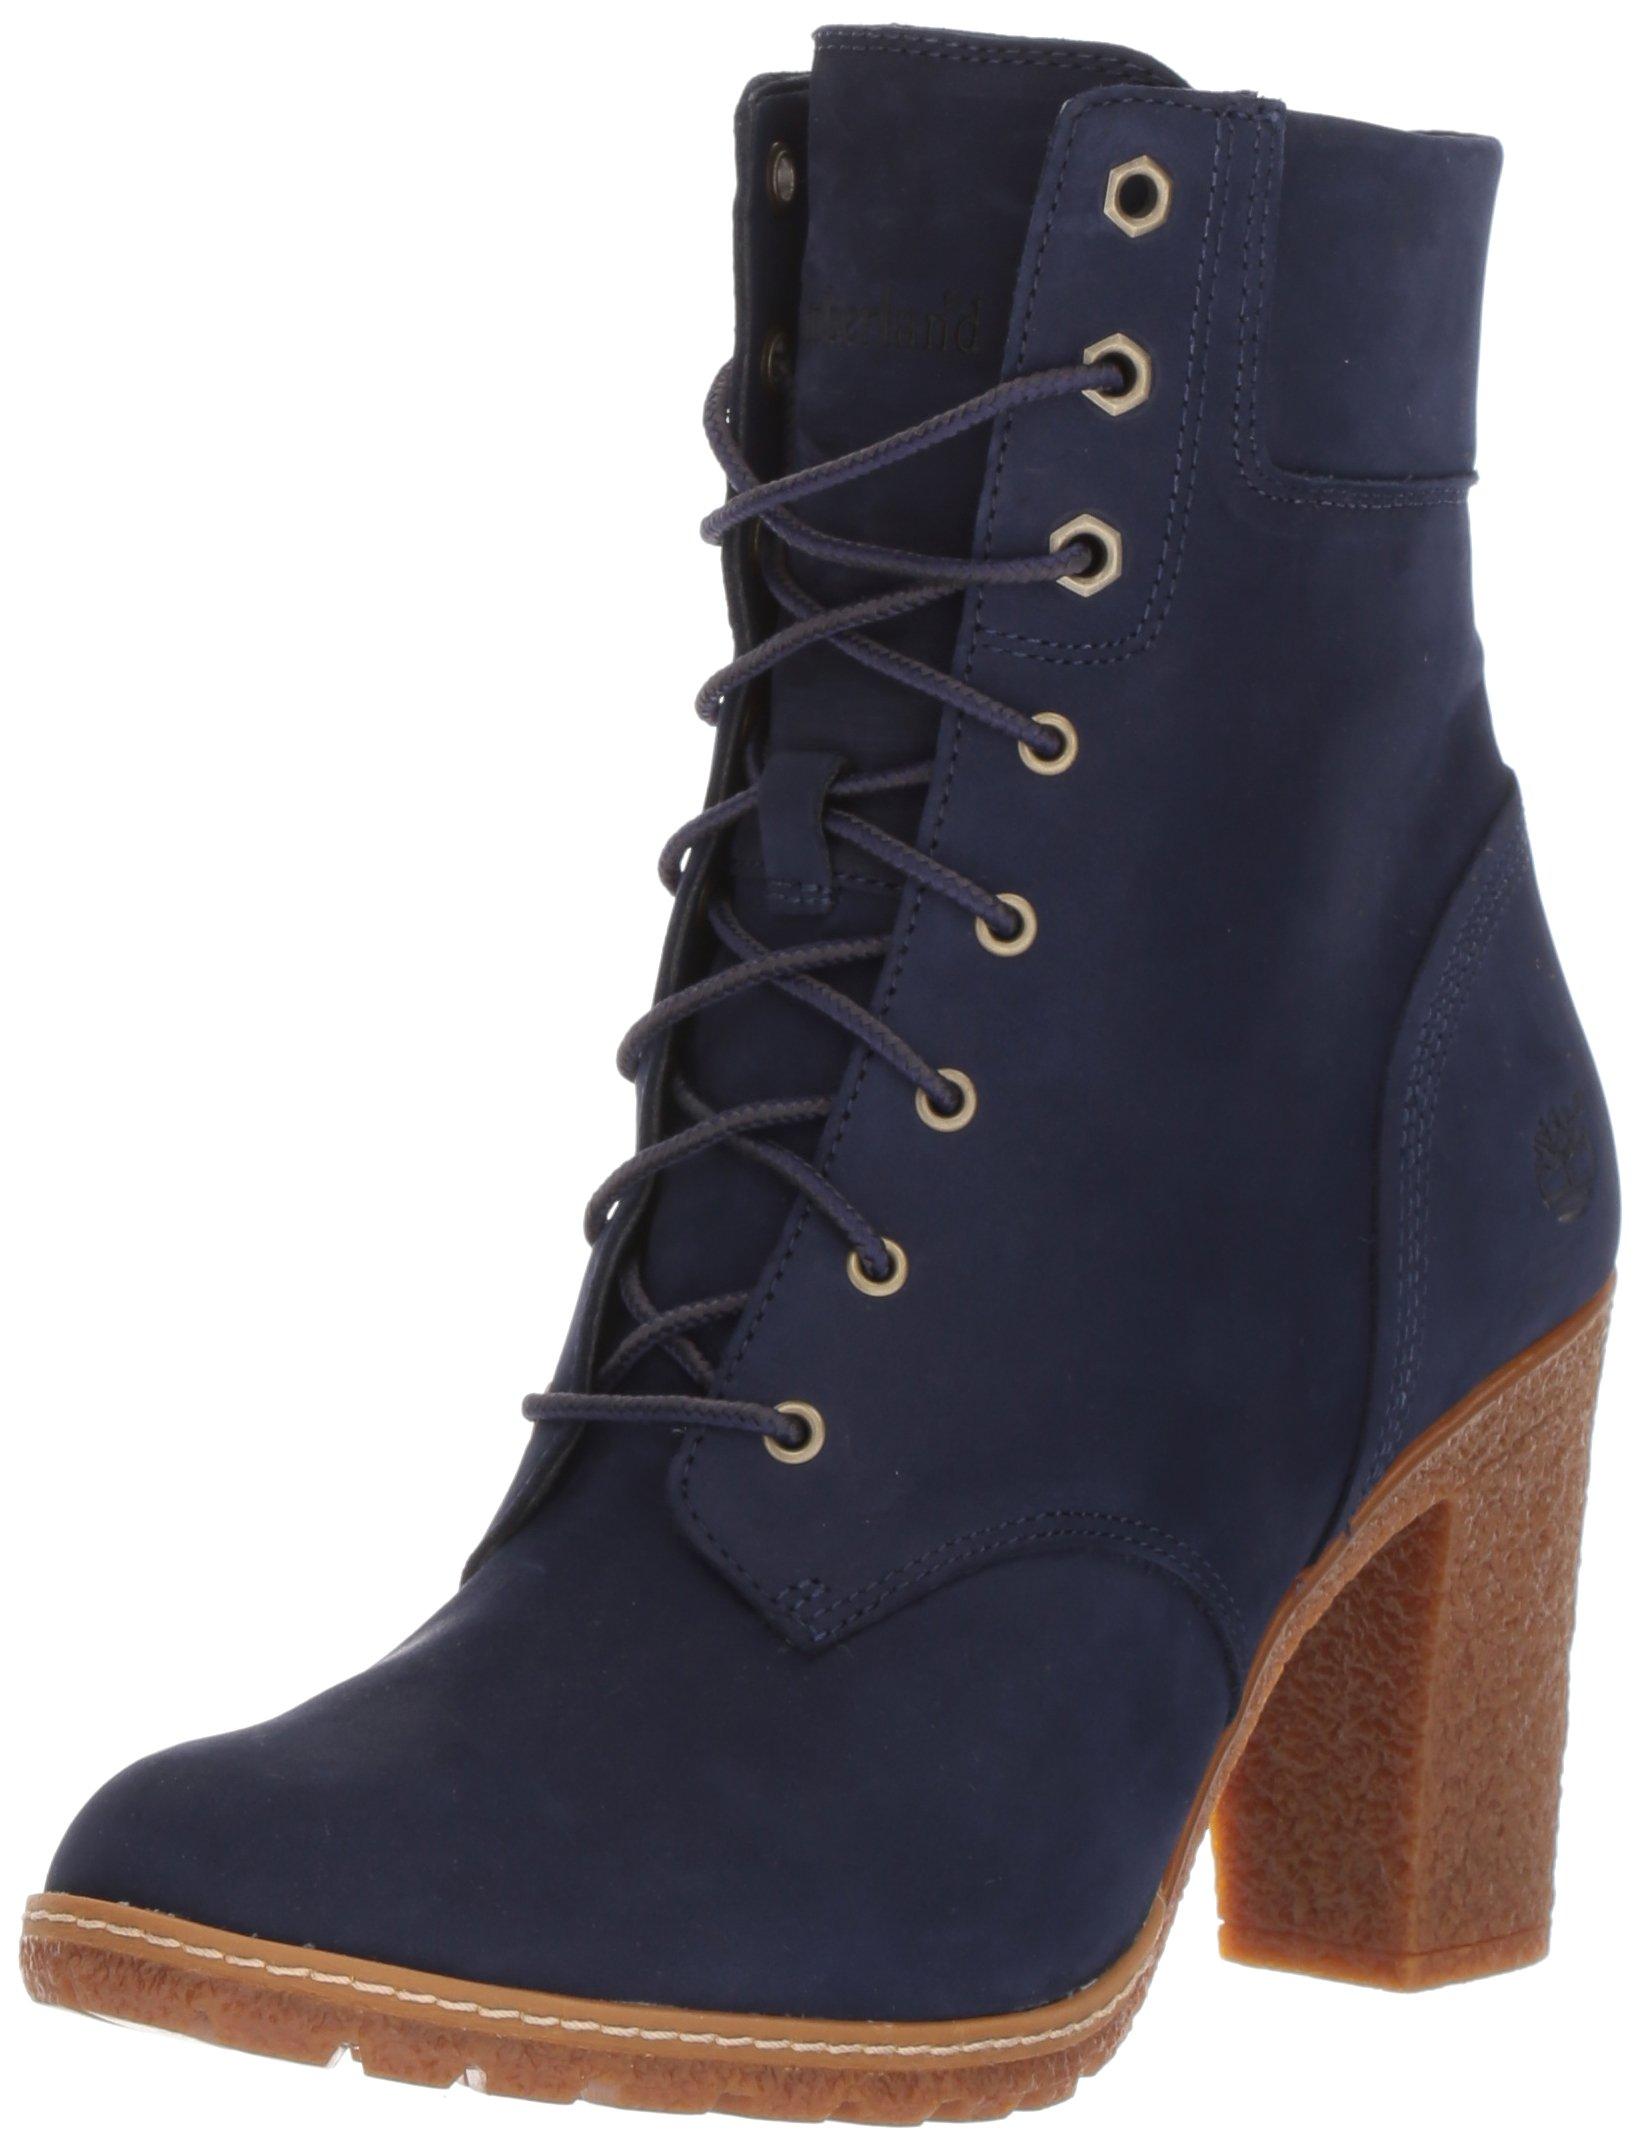 Timberland Women's Glancy 6 Ankle Bootie, Dark Blue, 9 M US